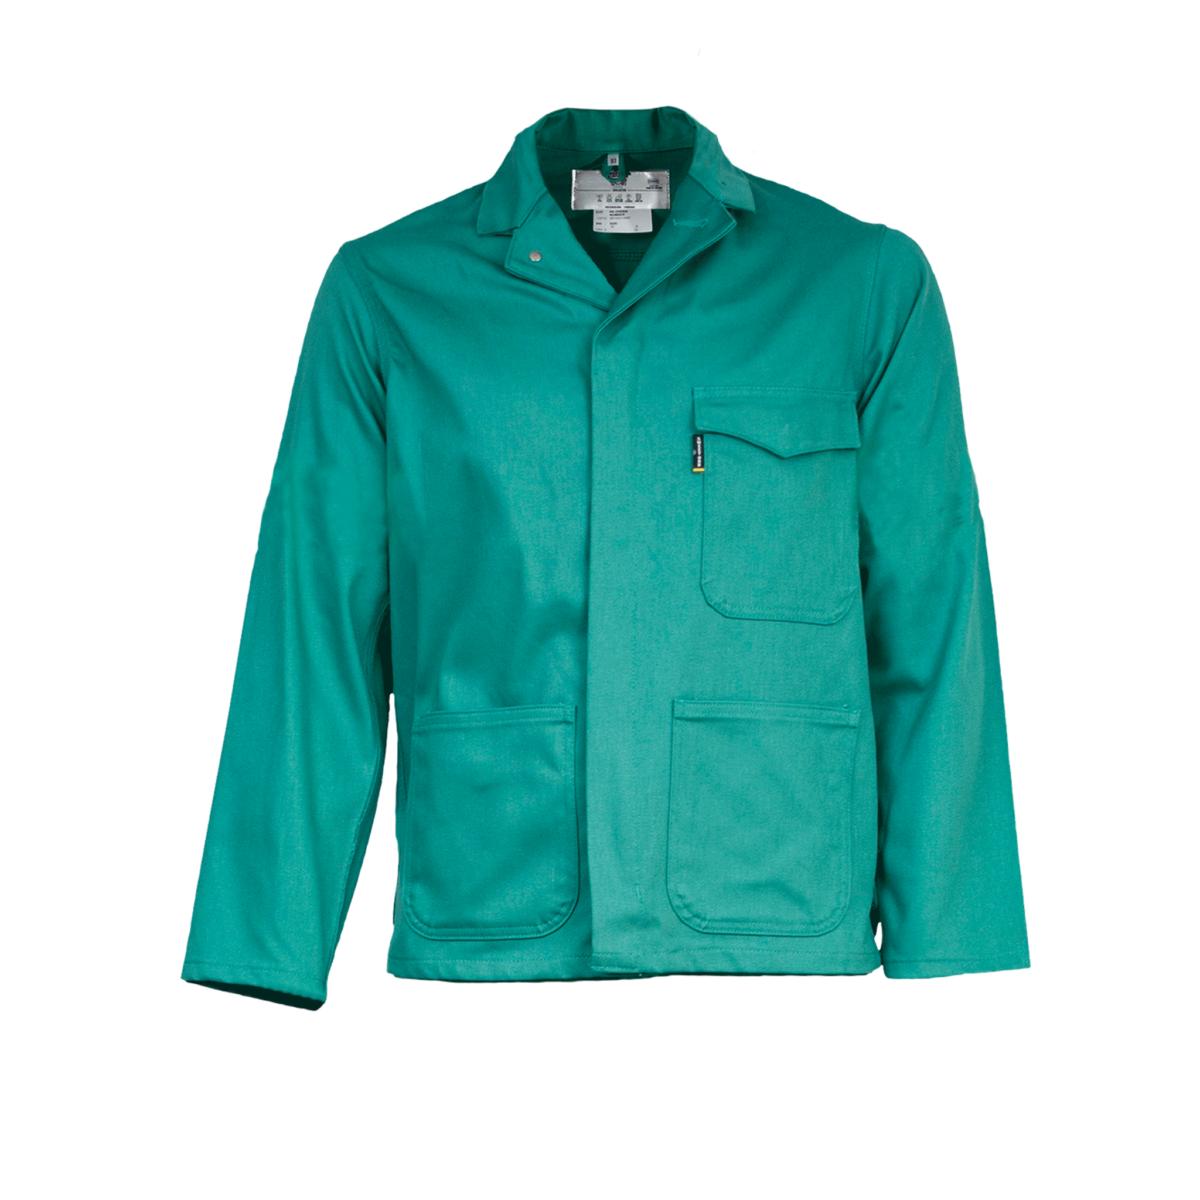 Sweet-Orr Fern Green Flame Retardant Overall Jacket